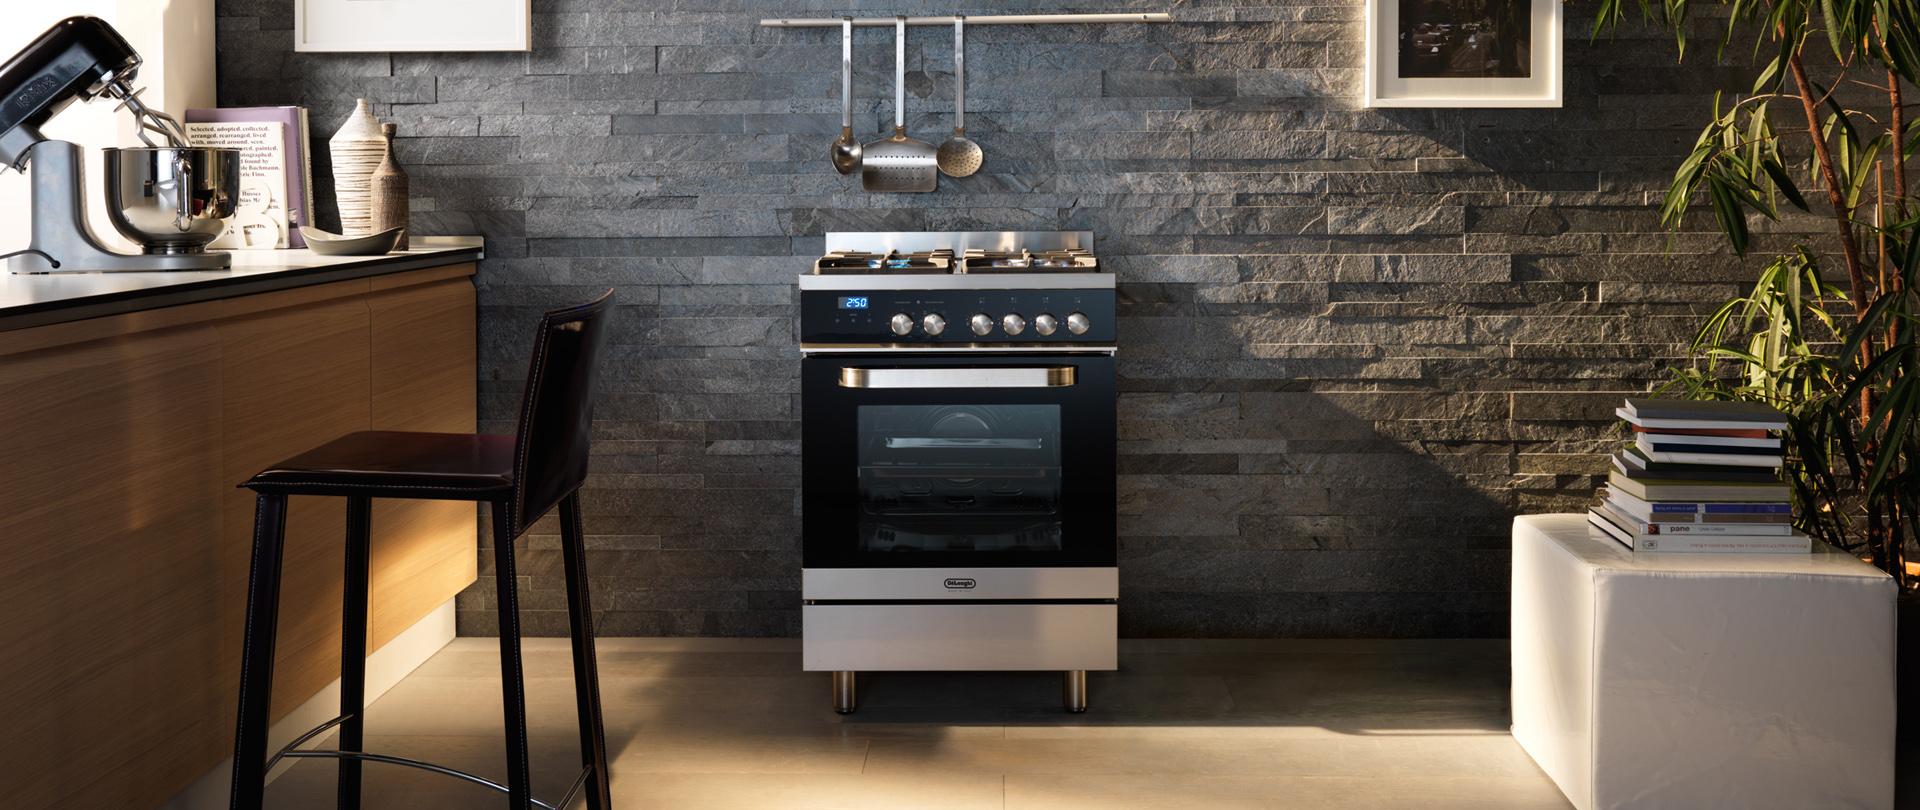 Cucina free standing linea Soft